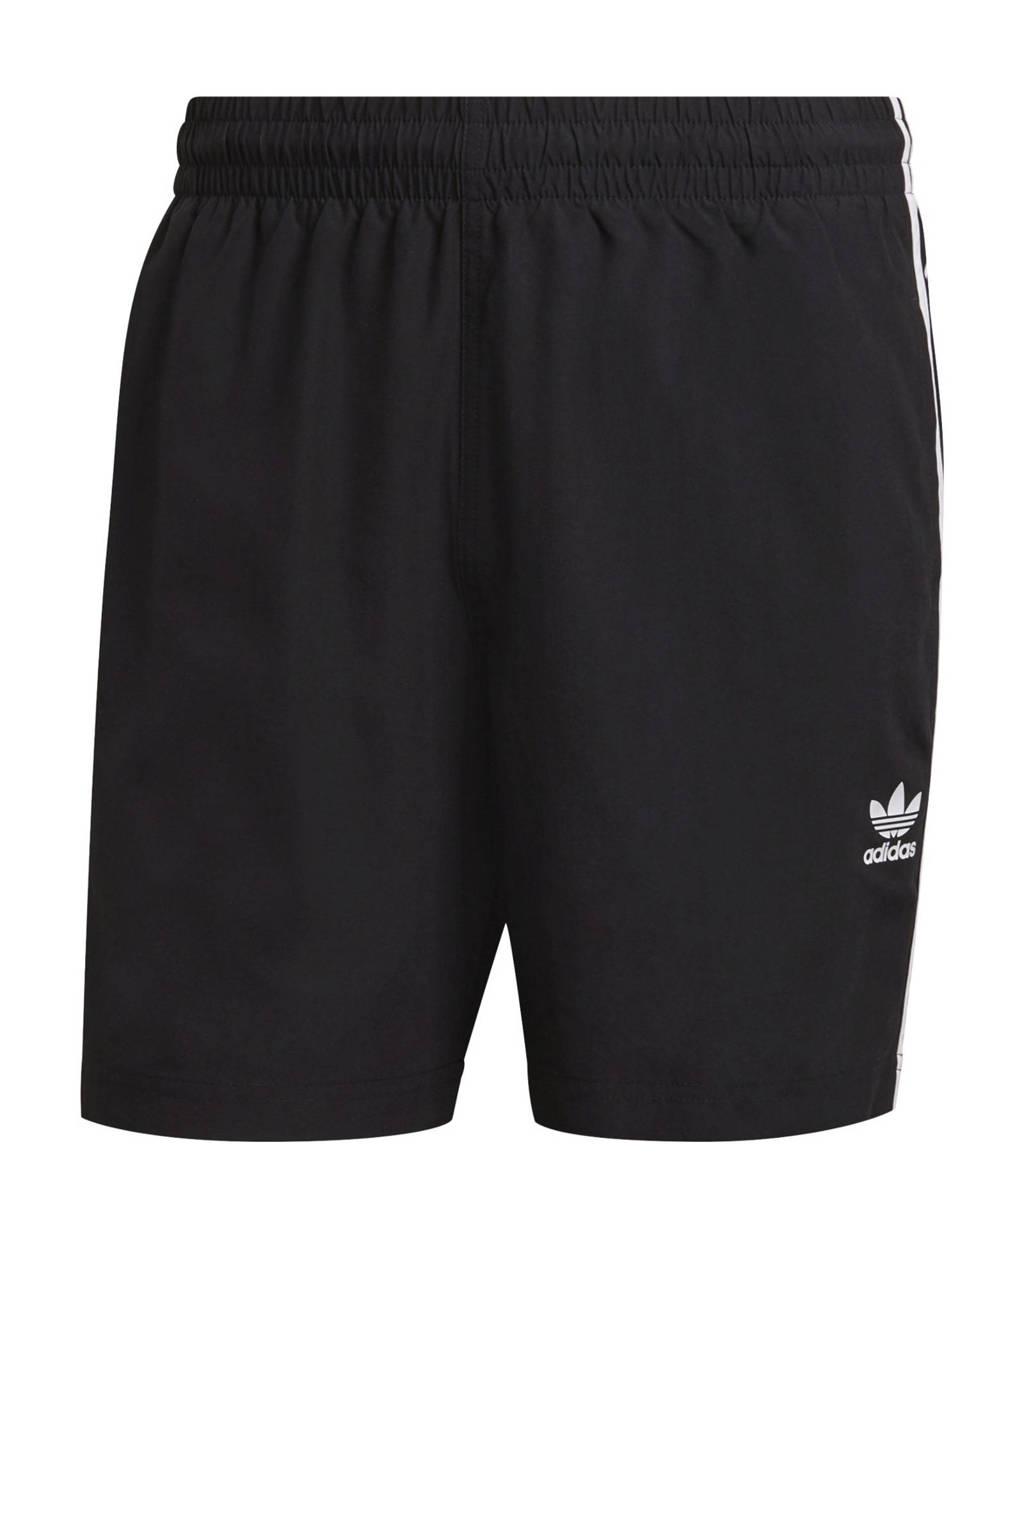 adidas Originals Adicolor zwemshort zwart, Zwart